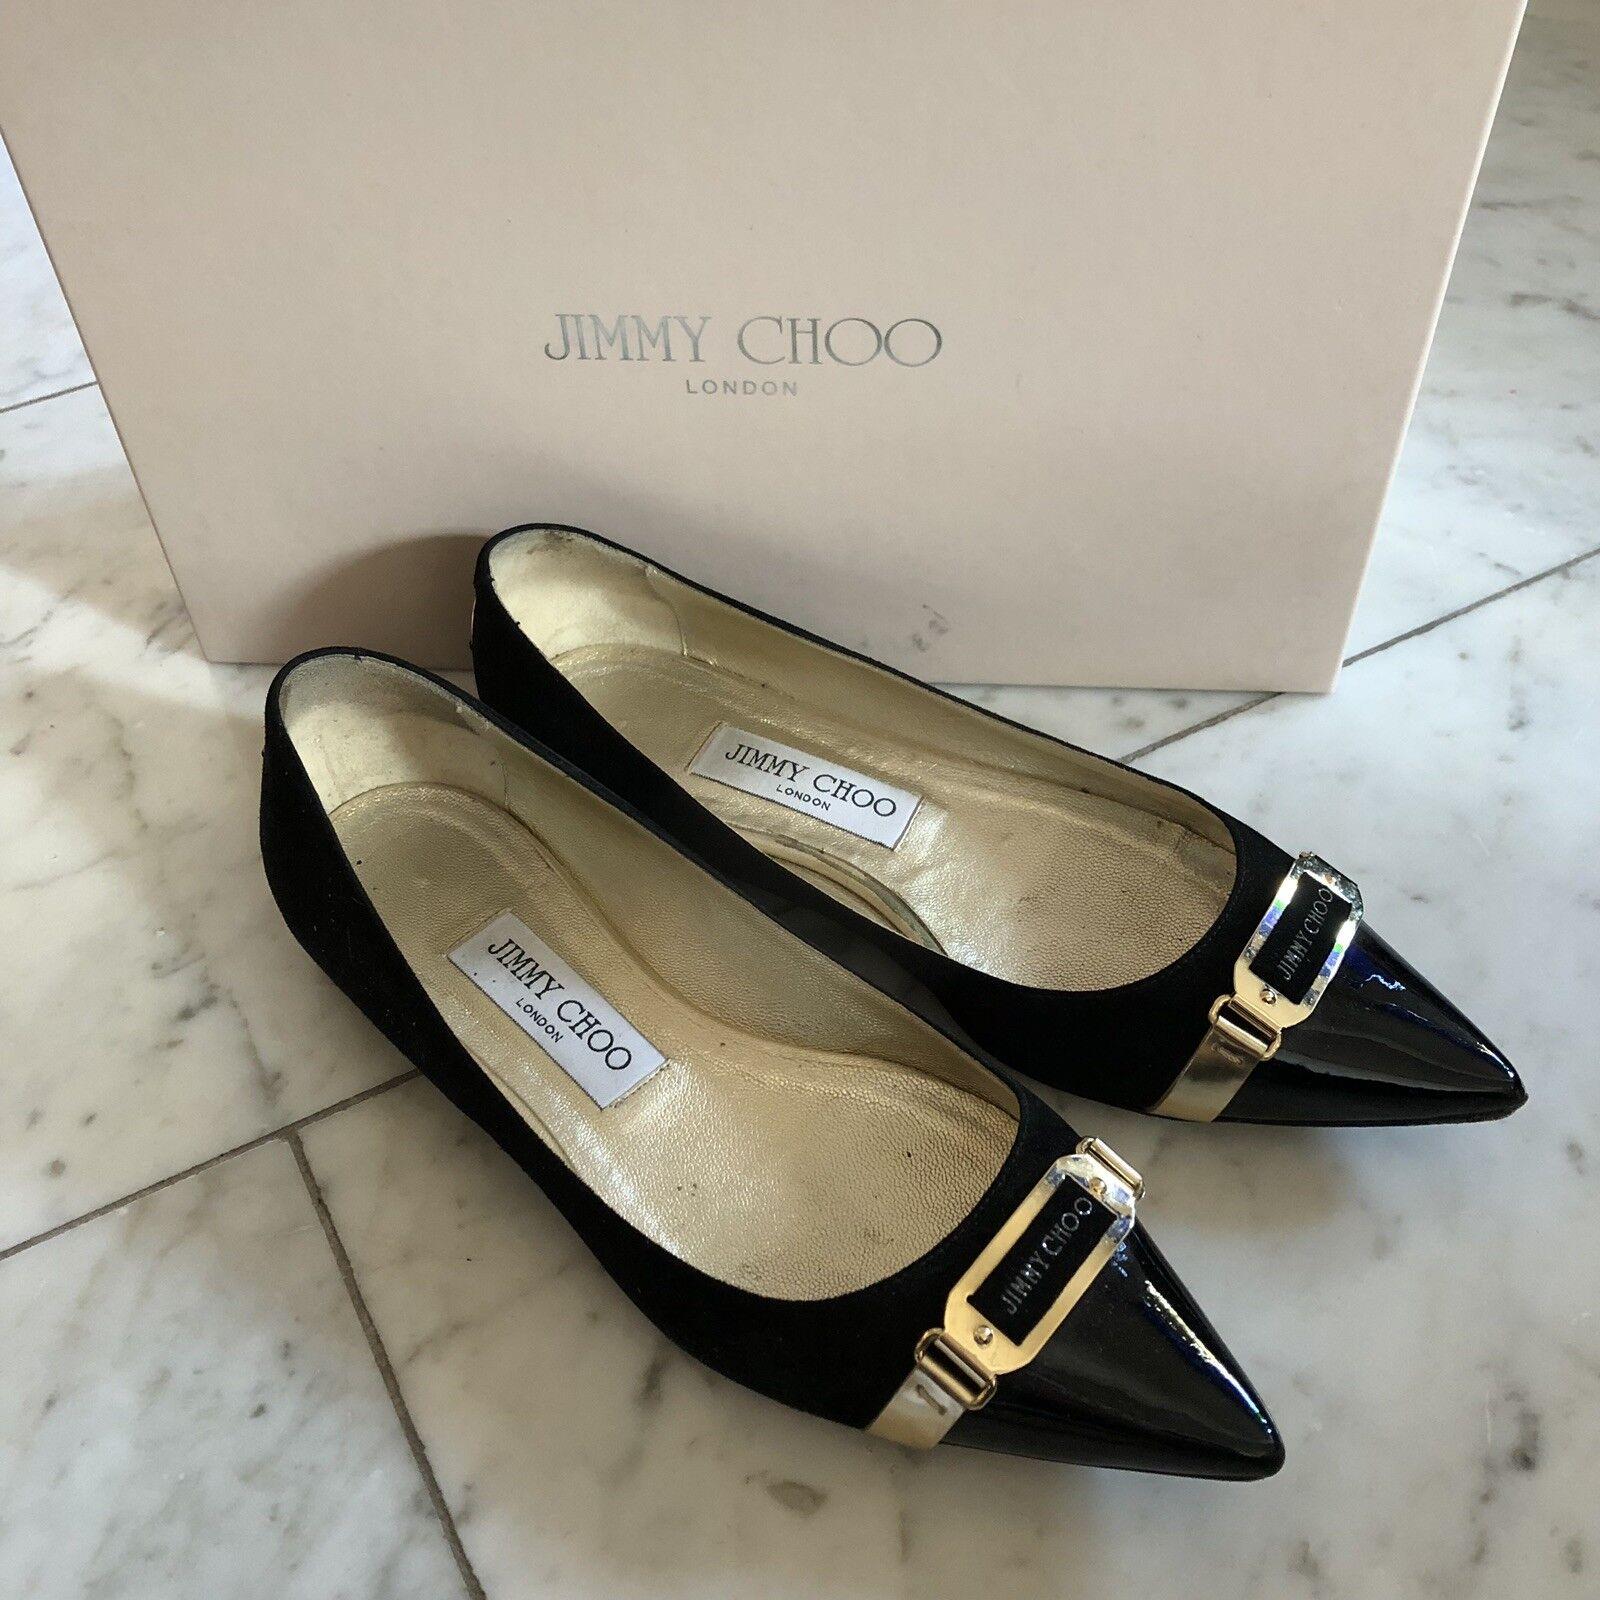 Jimmy Choo Choo Choo Ballerinas Gr. 36 Schwarz Lack Spitz Gold Top Sandalette ... 487809